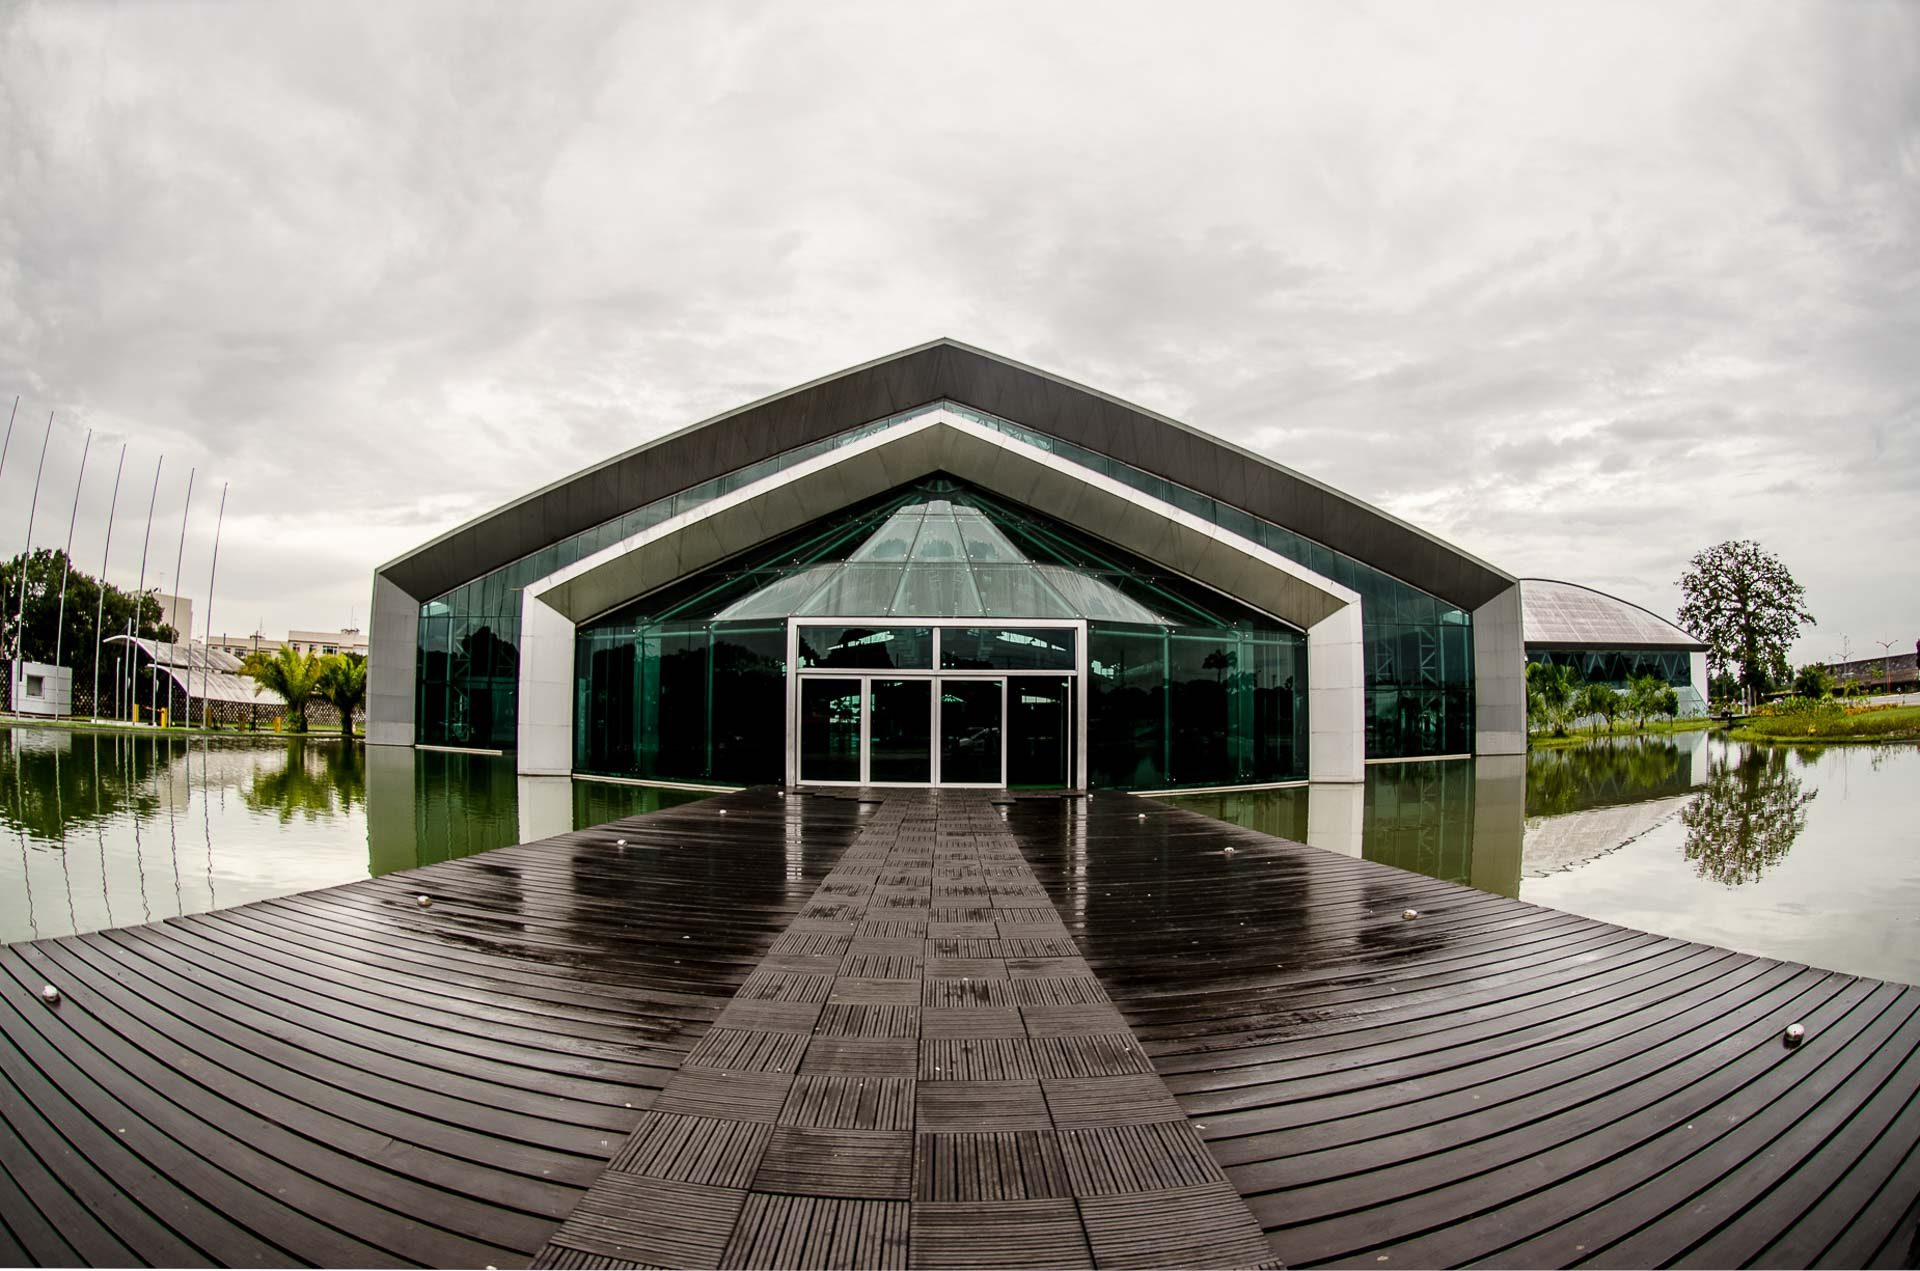 Hangar - Centro de convenções - Belém